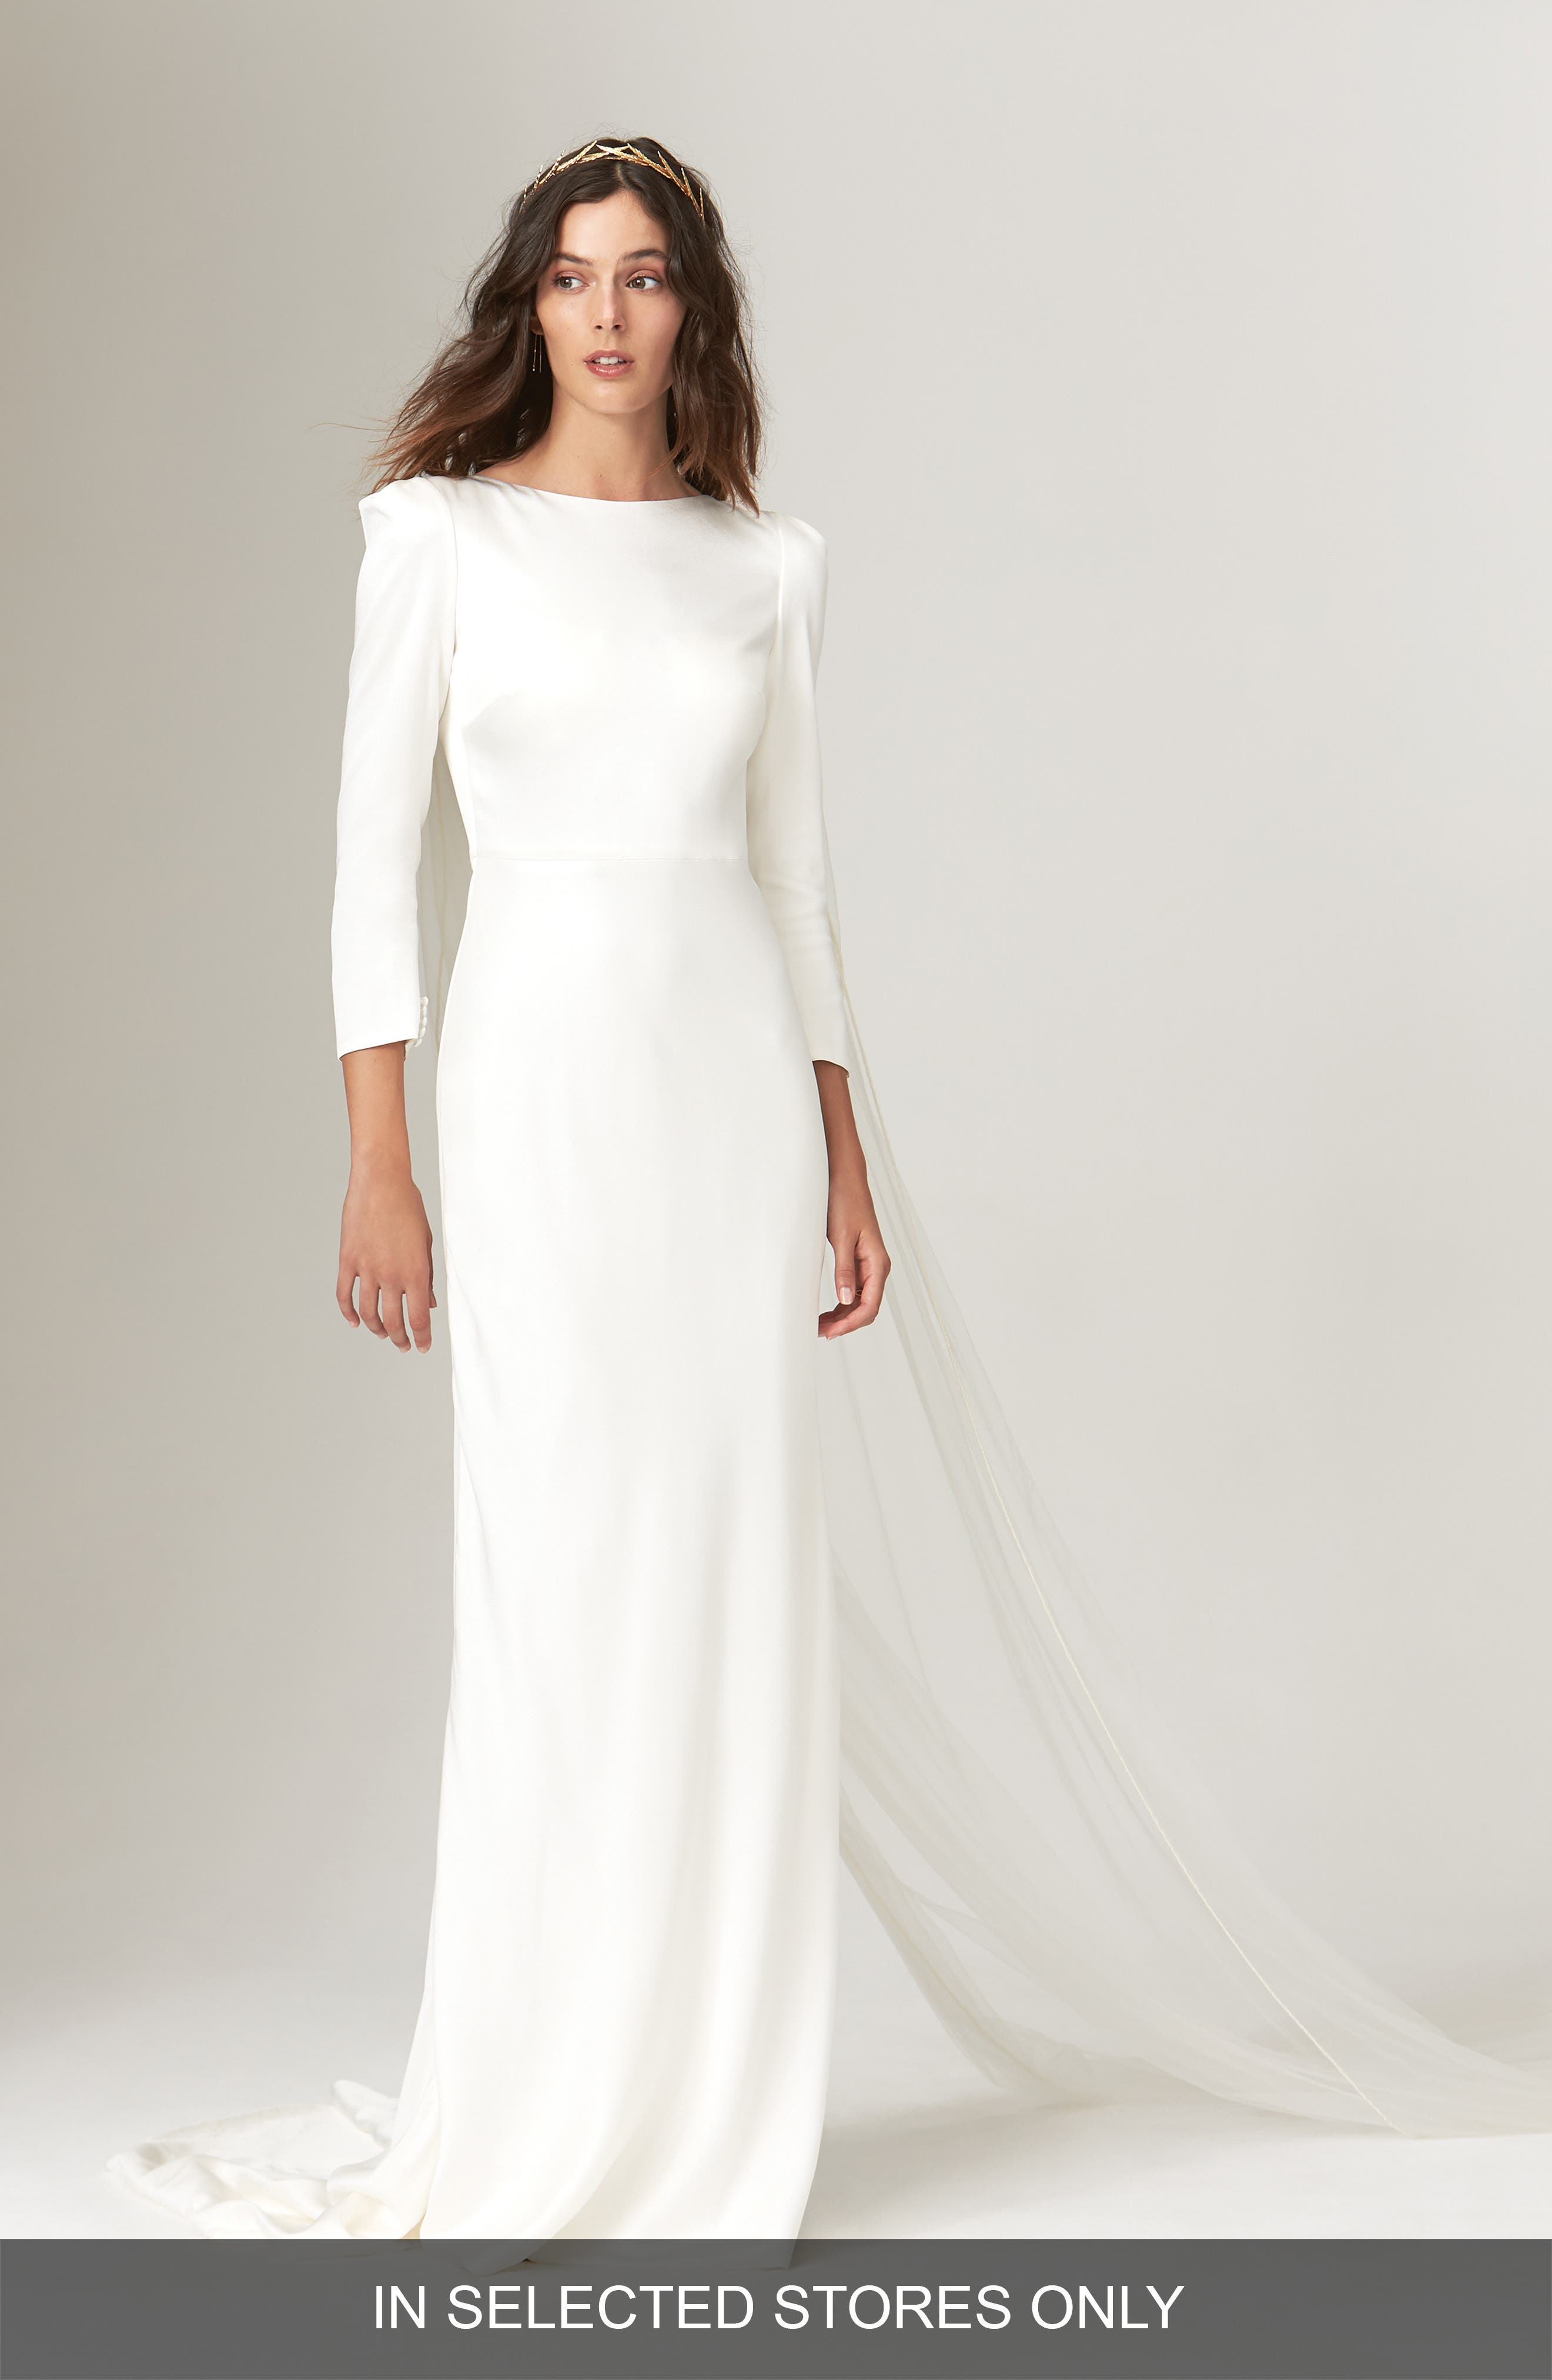 Gwendolyn Long Sleeve Open Back Wedding Dress in Ivory